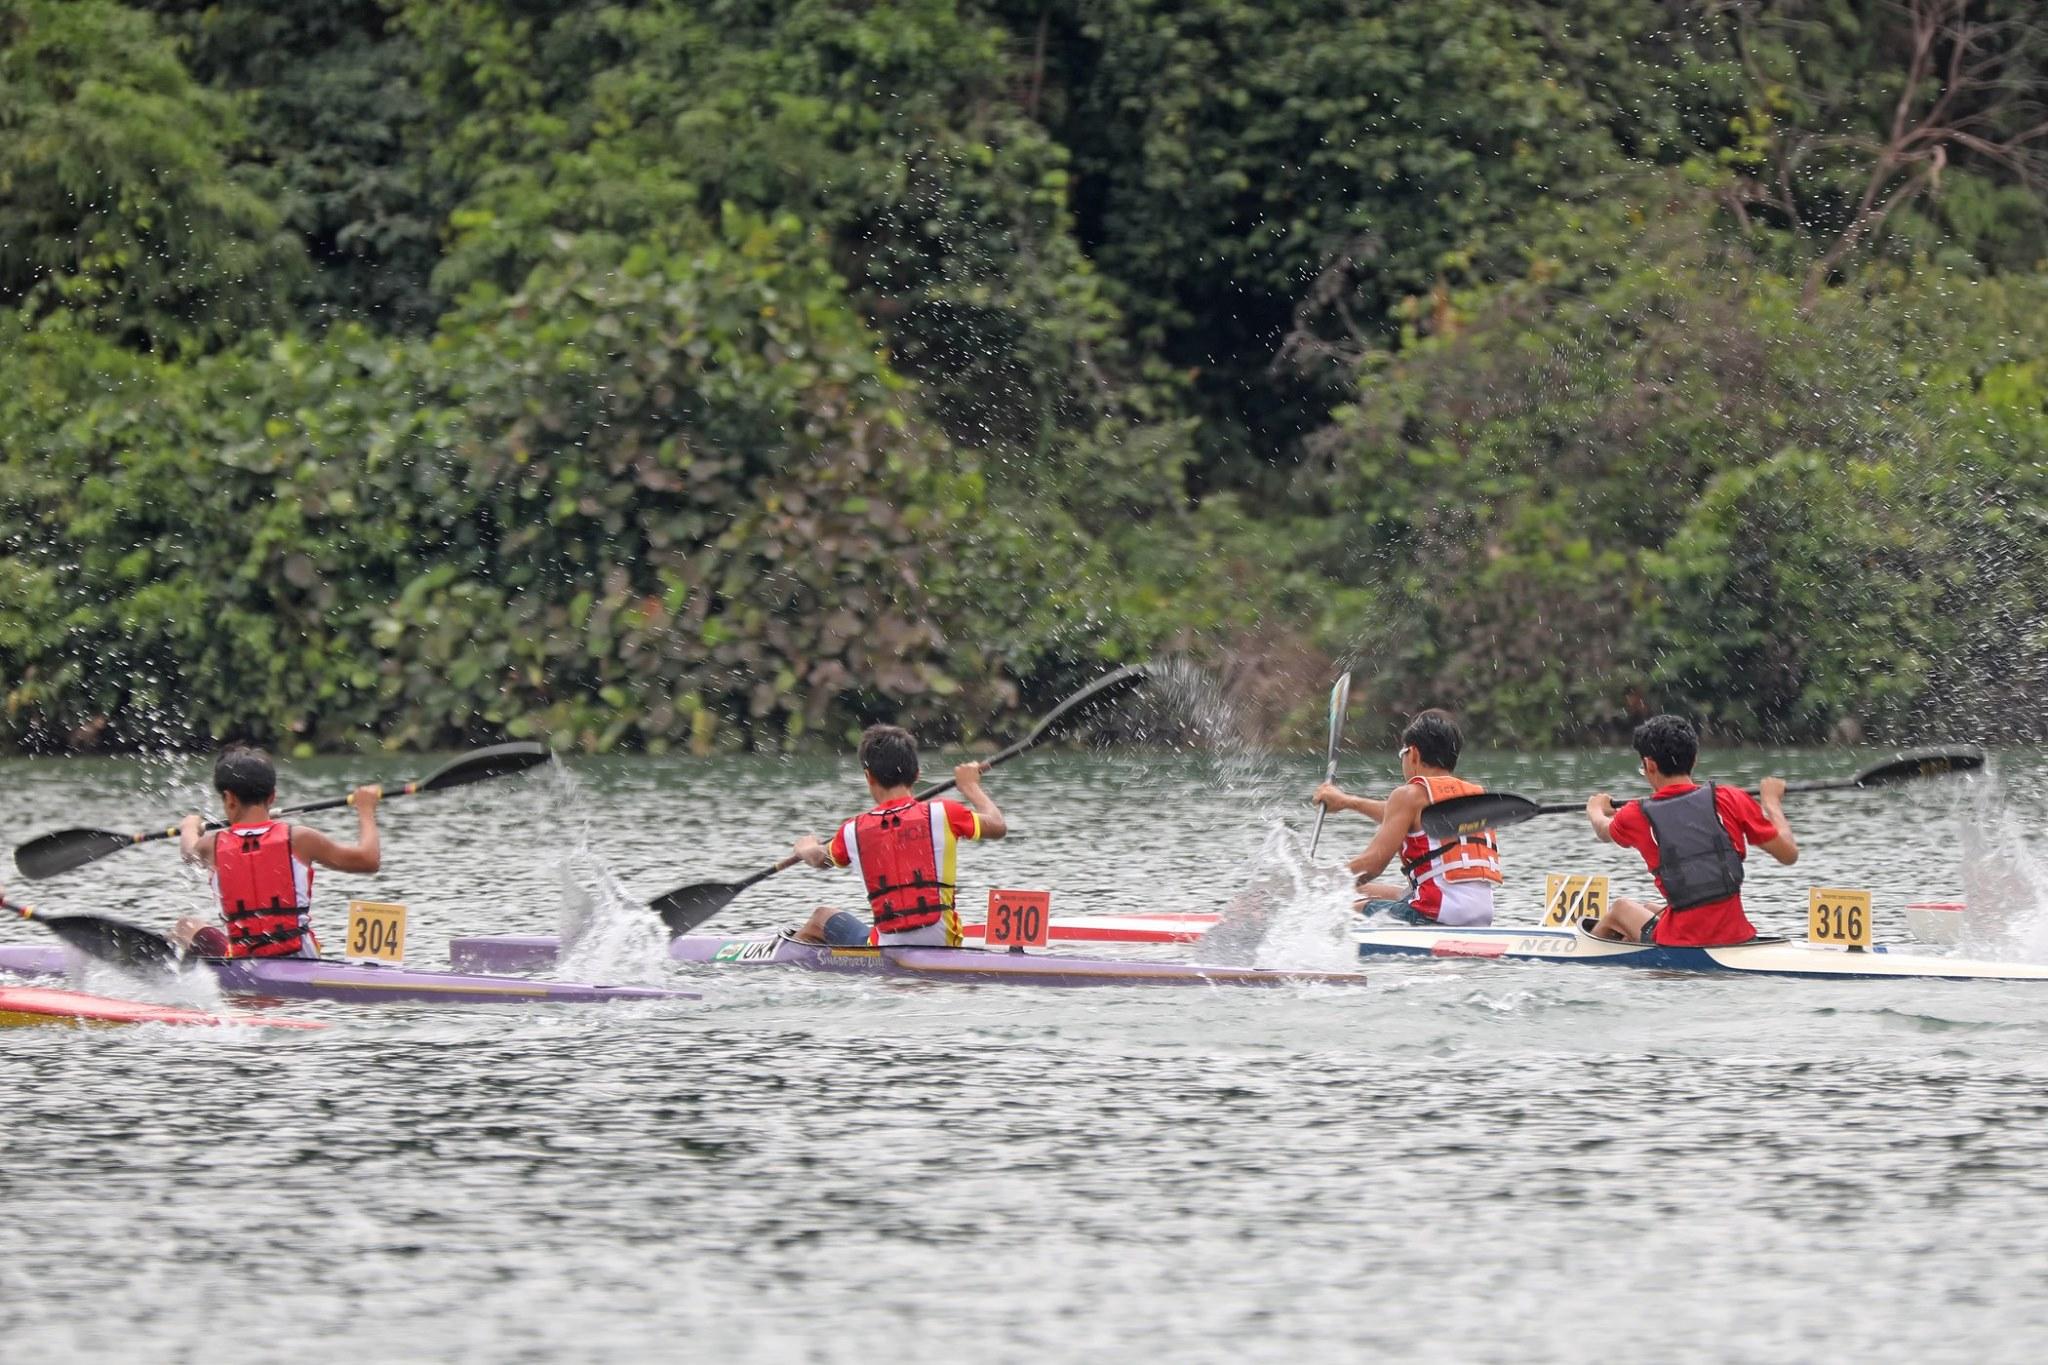 2021 Singapore Canoe Sprint and Paracanoe Championships